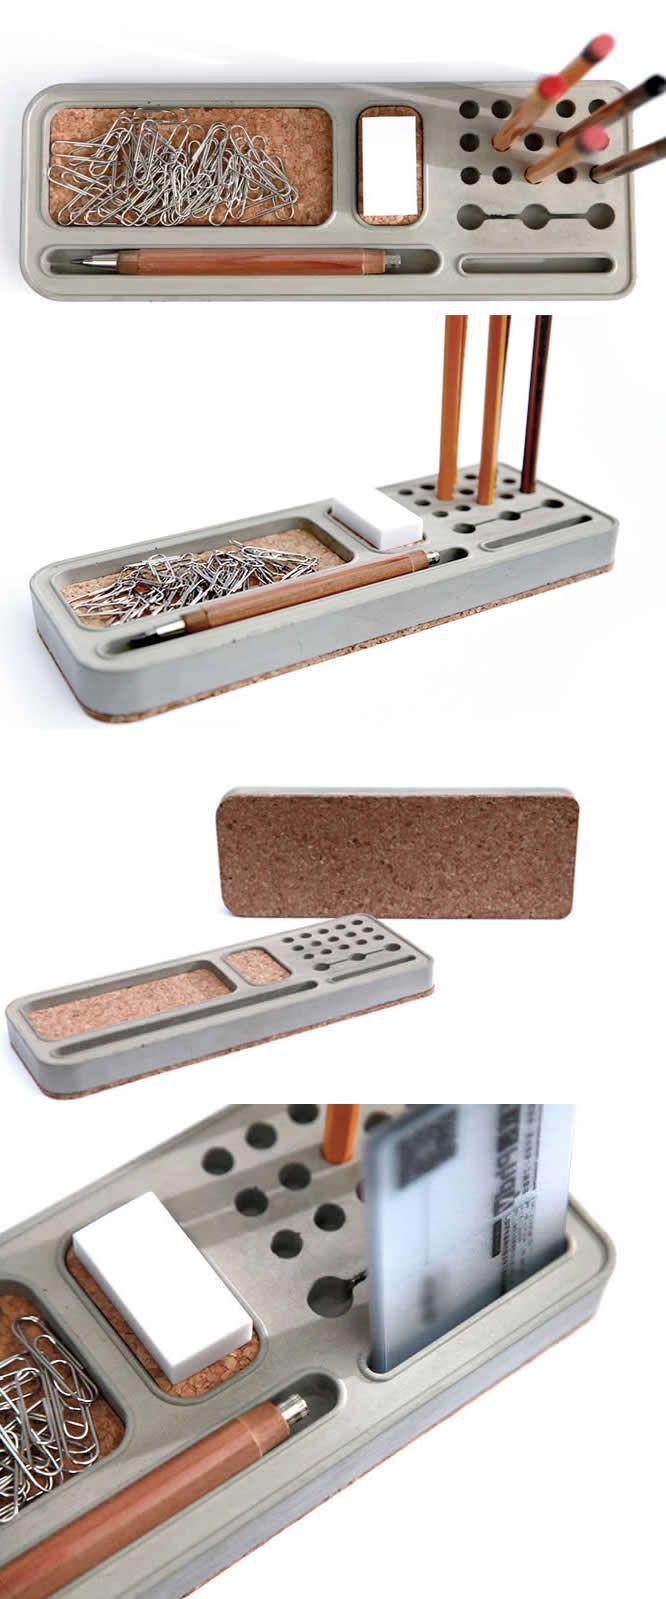 best 20 cool office desk ideas on pinterest mid century desk concrete smartphone pen pencil holder stand office desk organizer tray